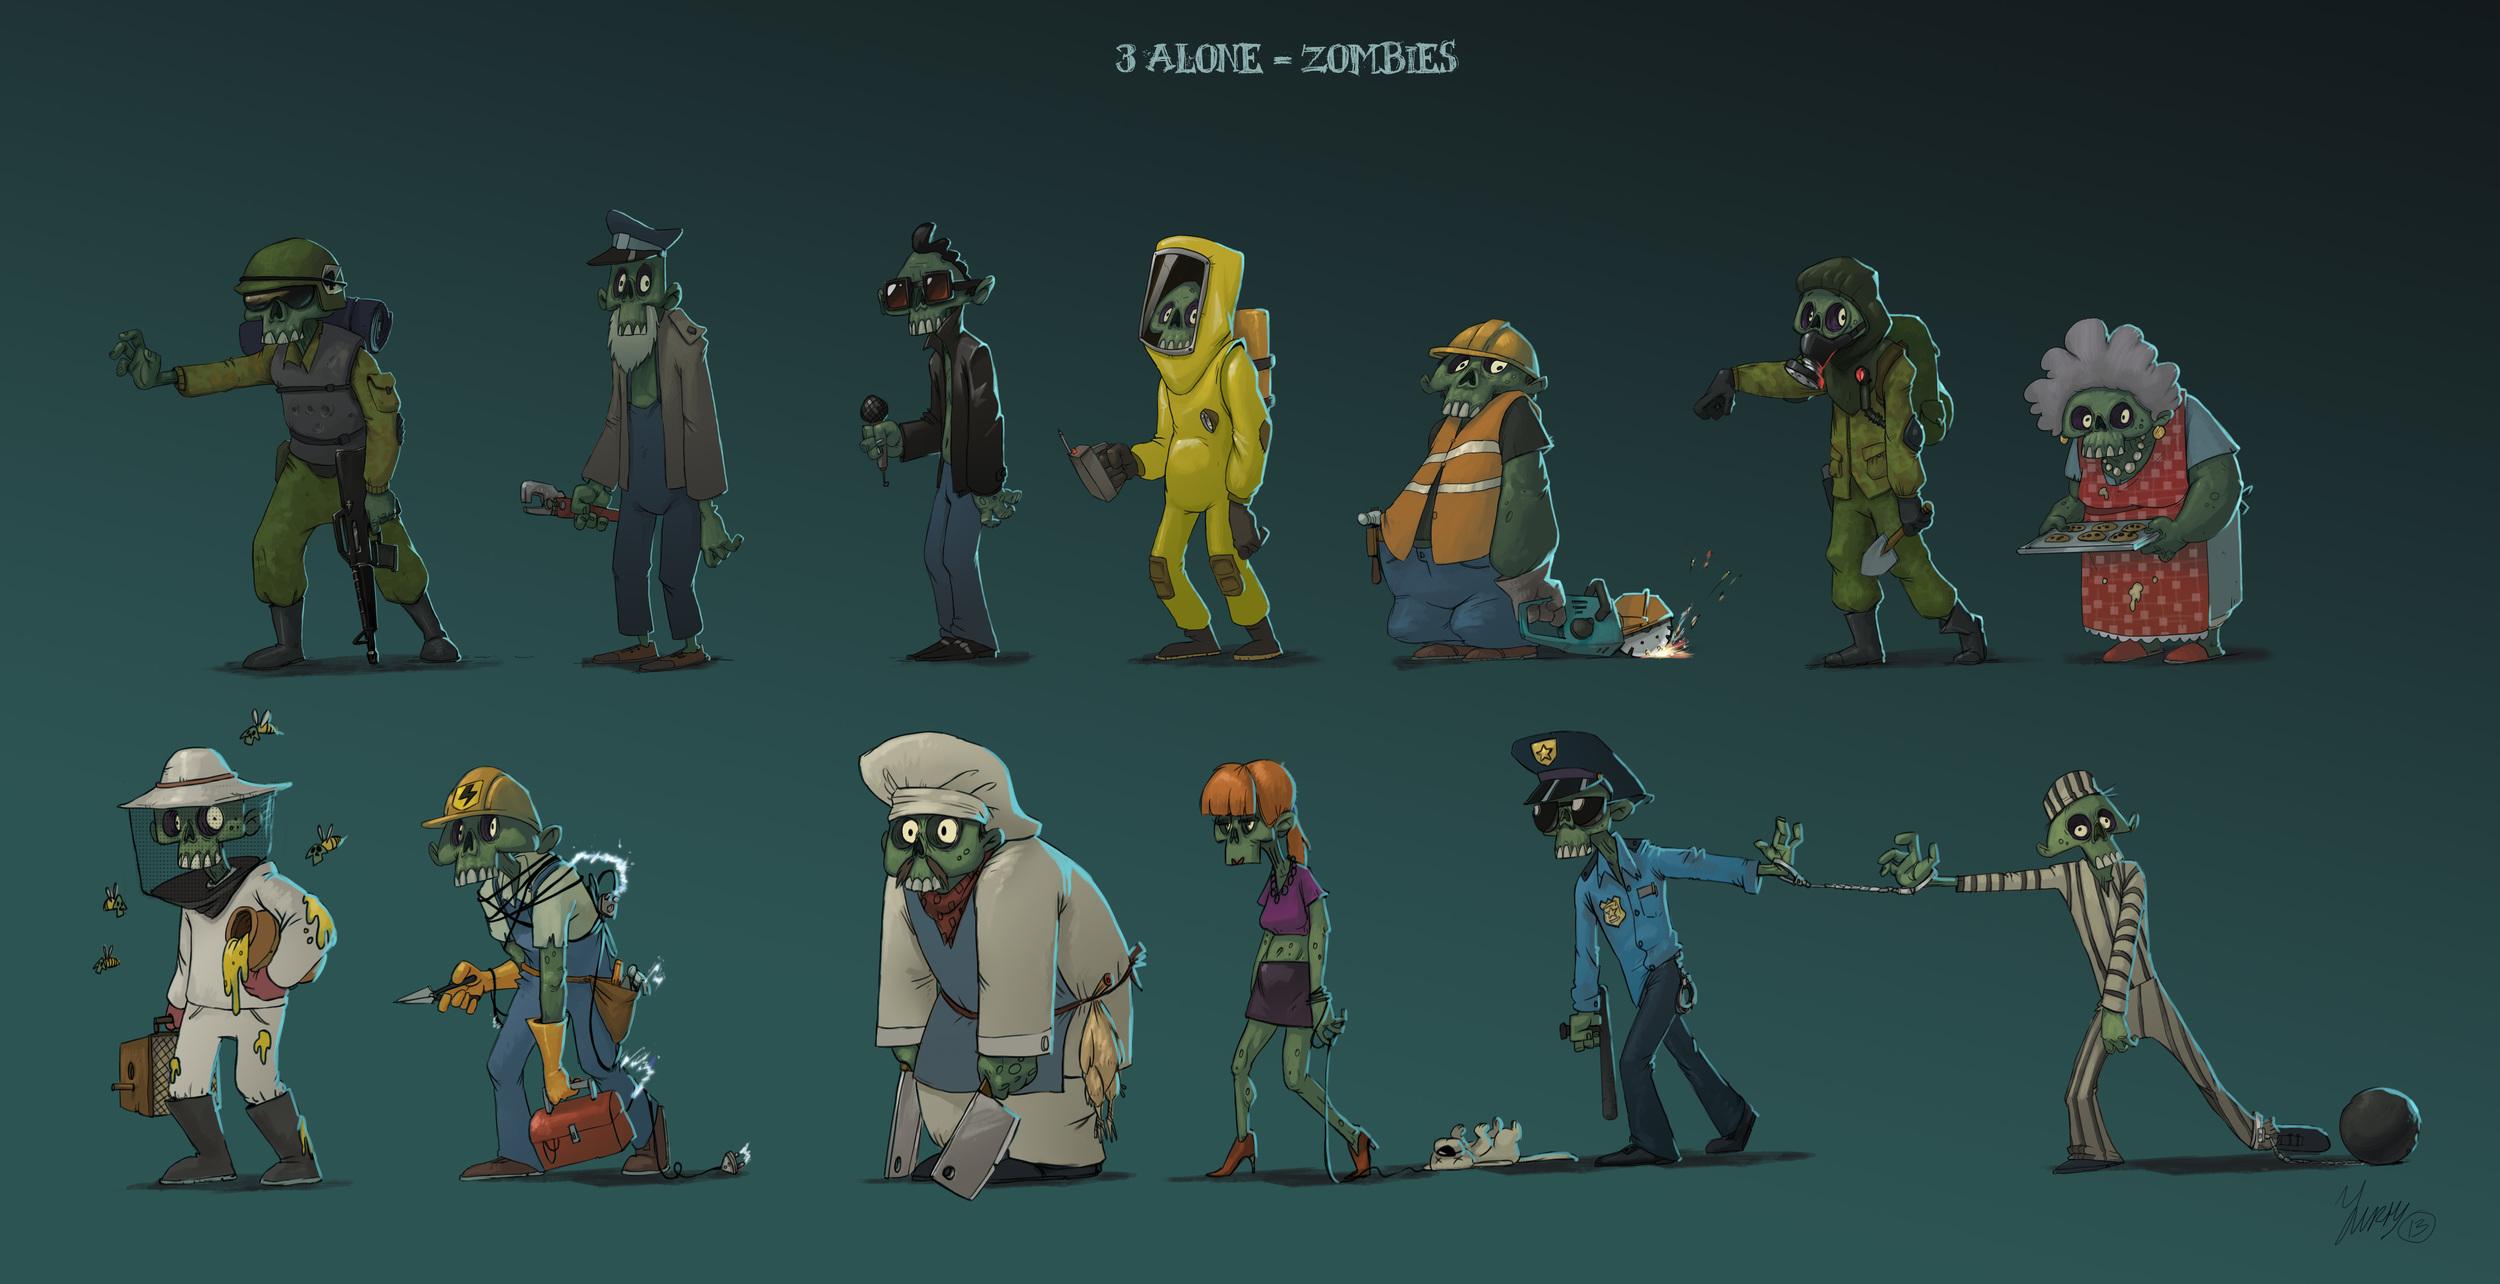 3_alone_zombies.jpg